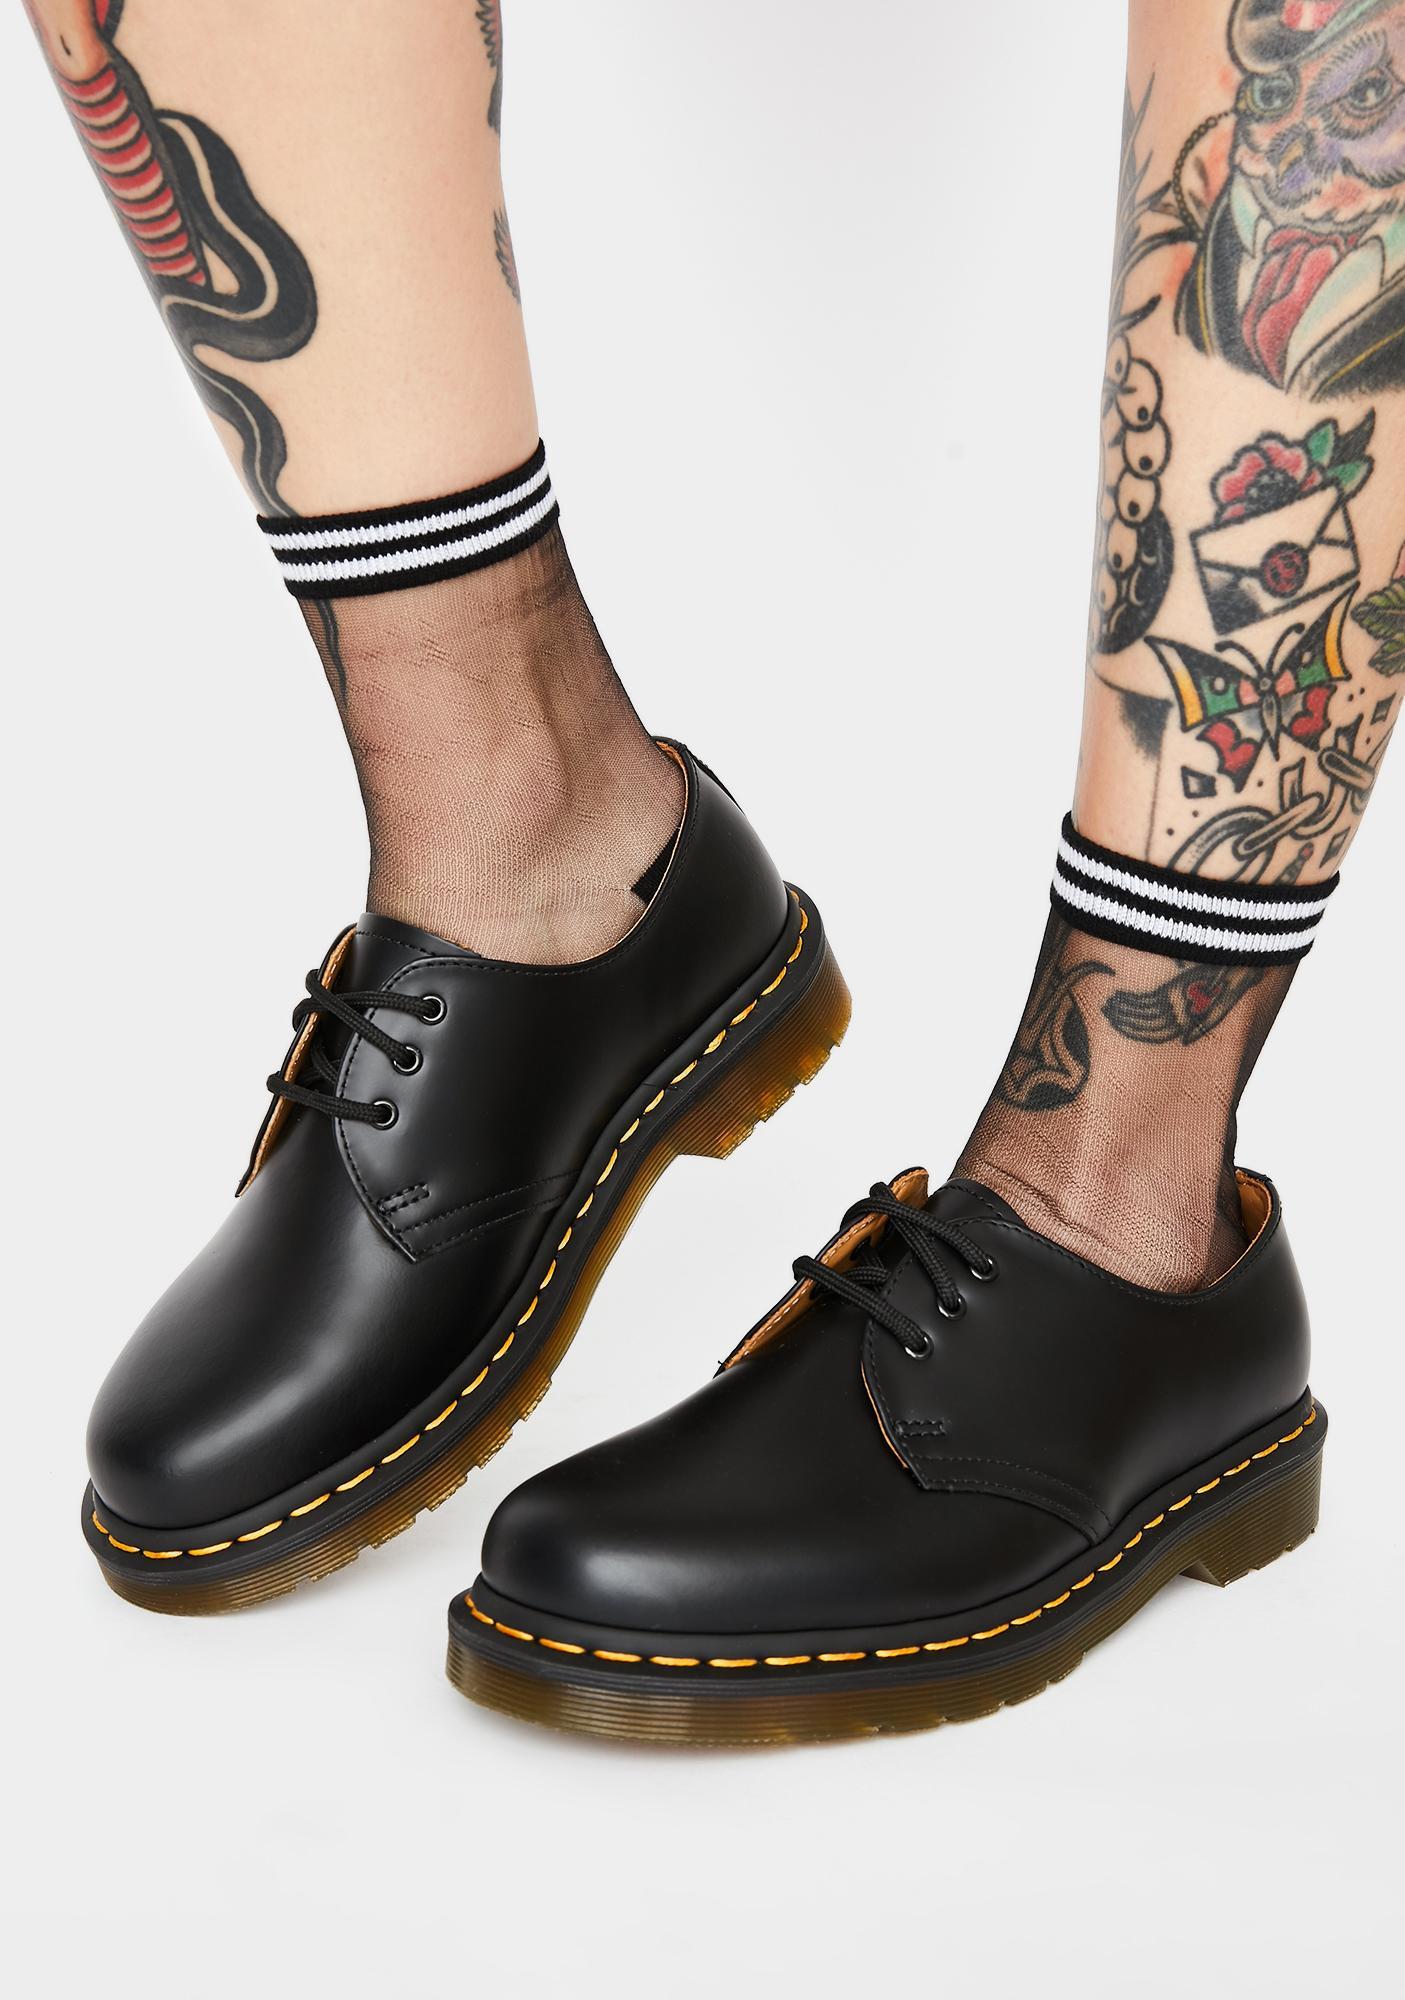 black 1461 pascal velvet flat shoes